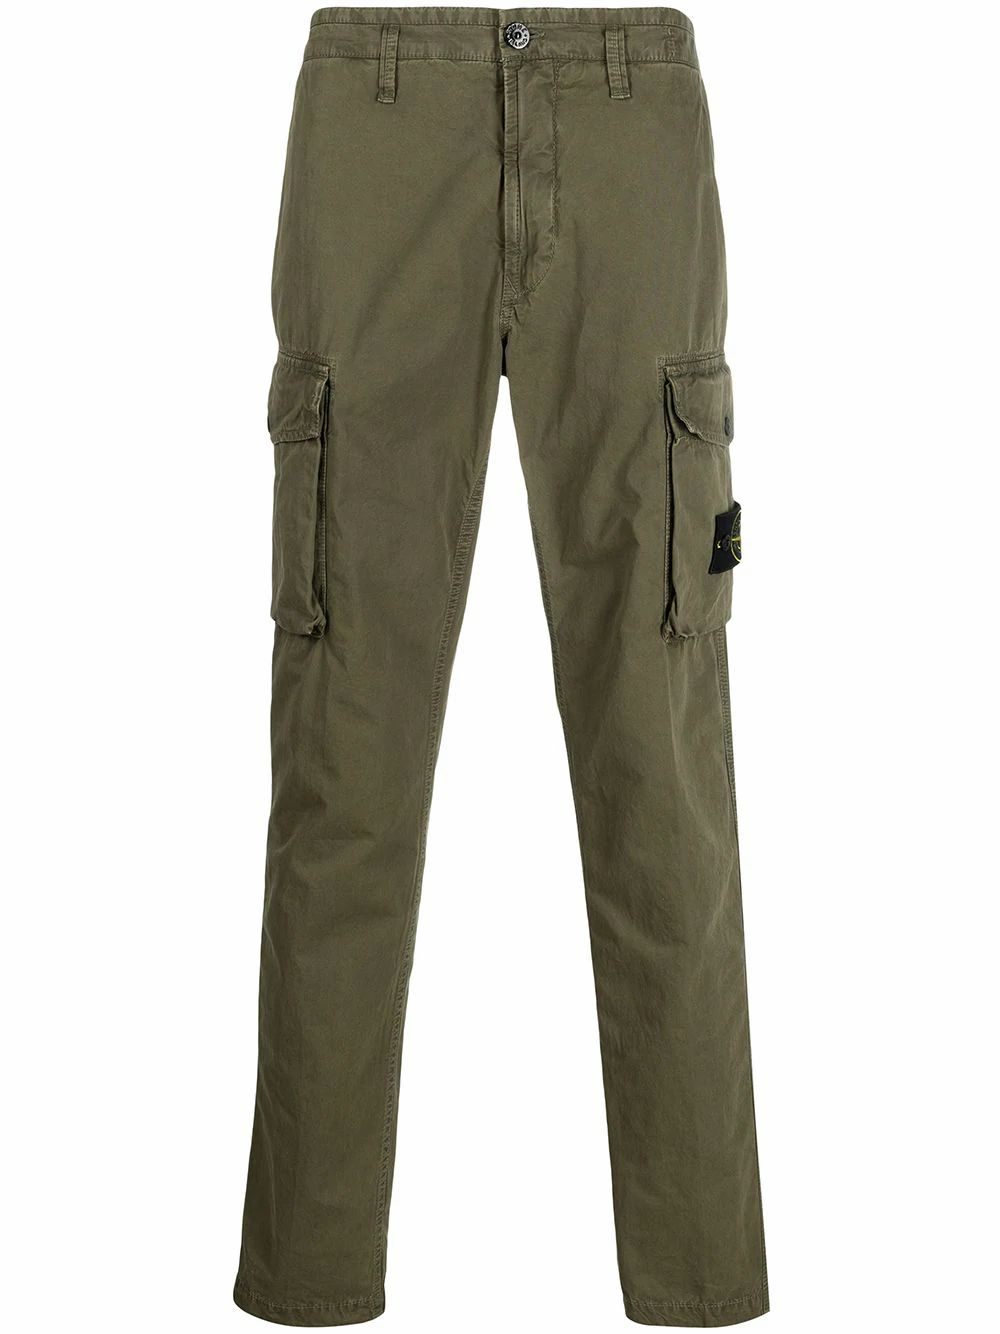 Stone Island Pants STONE ISLAND MEN'S GREEN COTTON PANTS